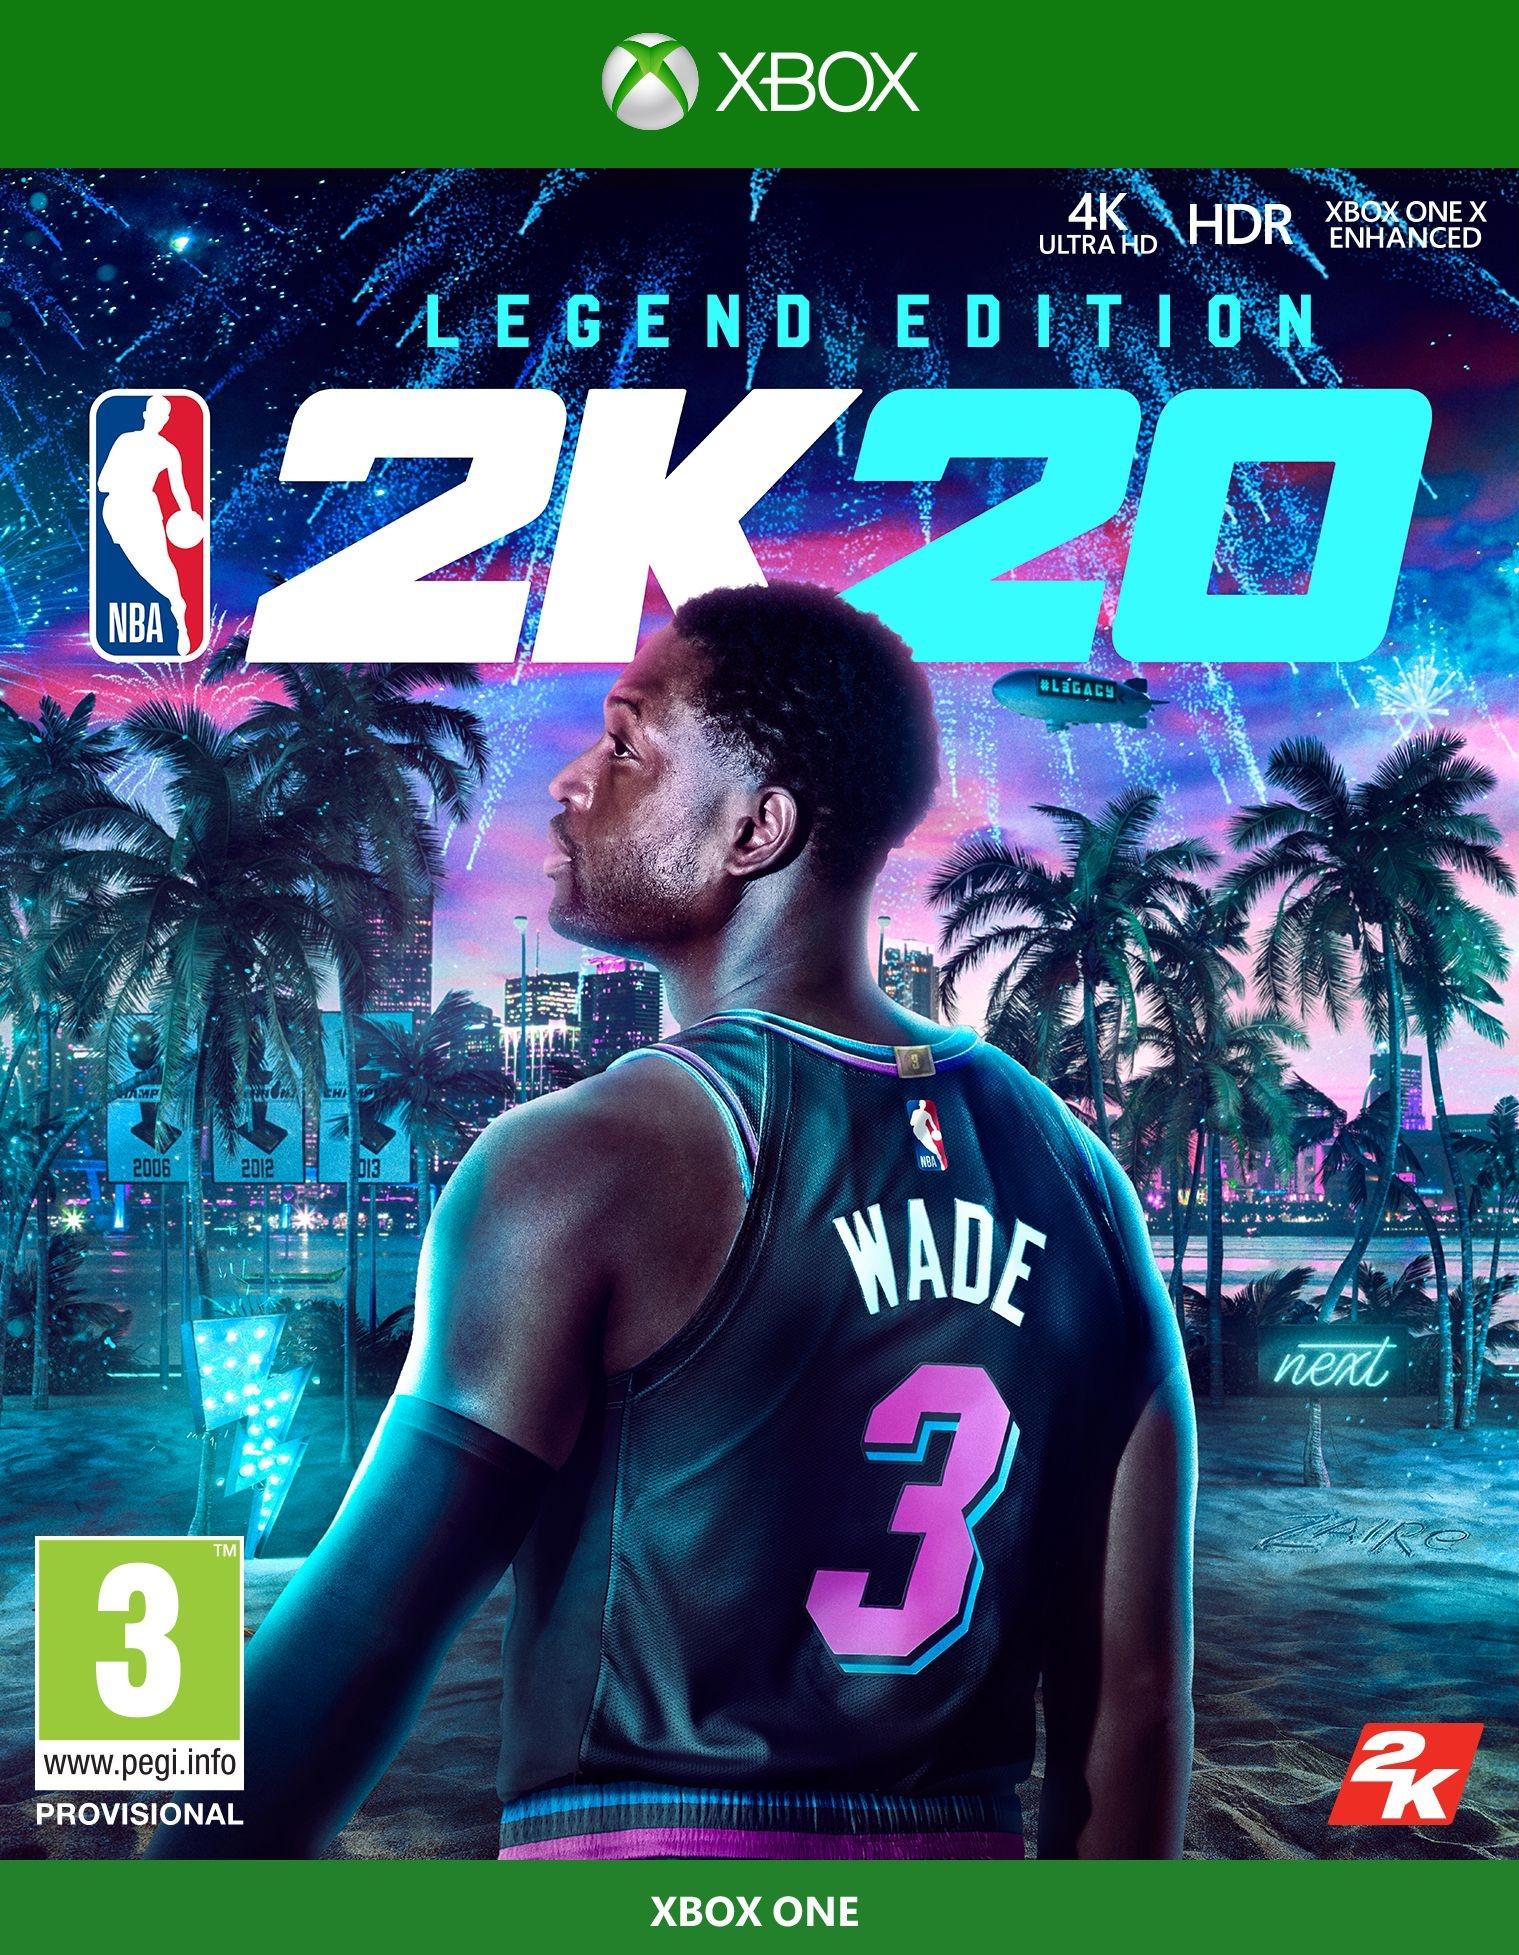 XBOXOne NBA 2K20 Legend Edition